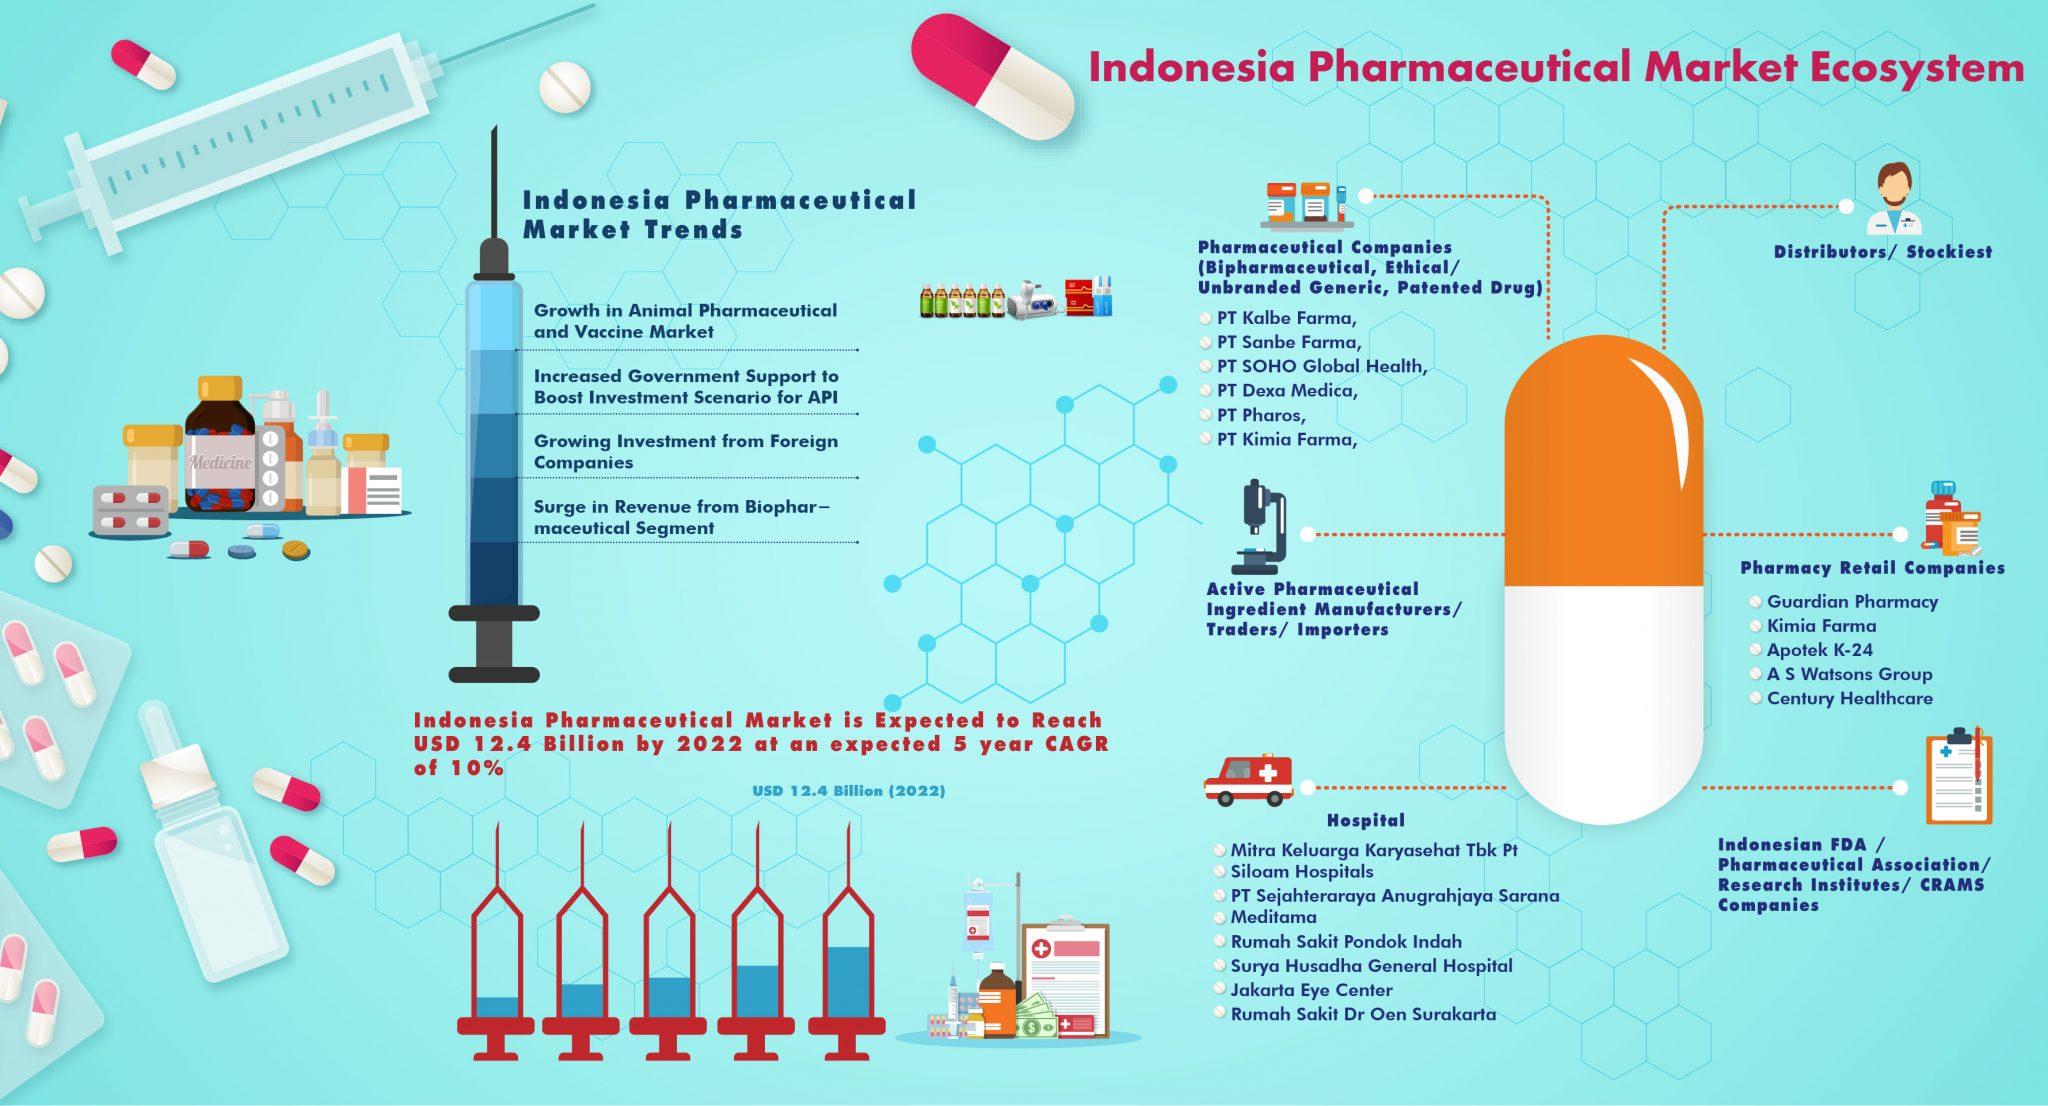 Indonesia Pharmaceutical Market